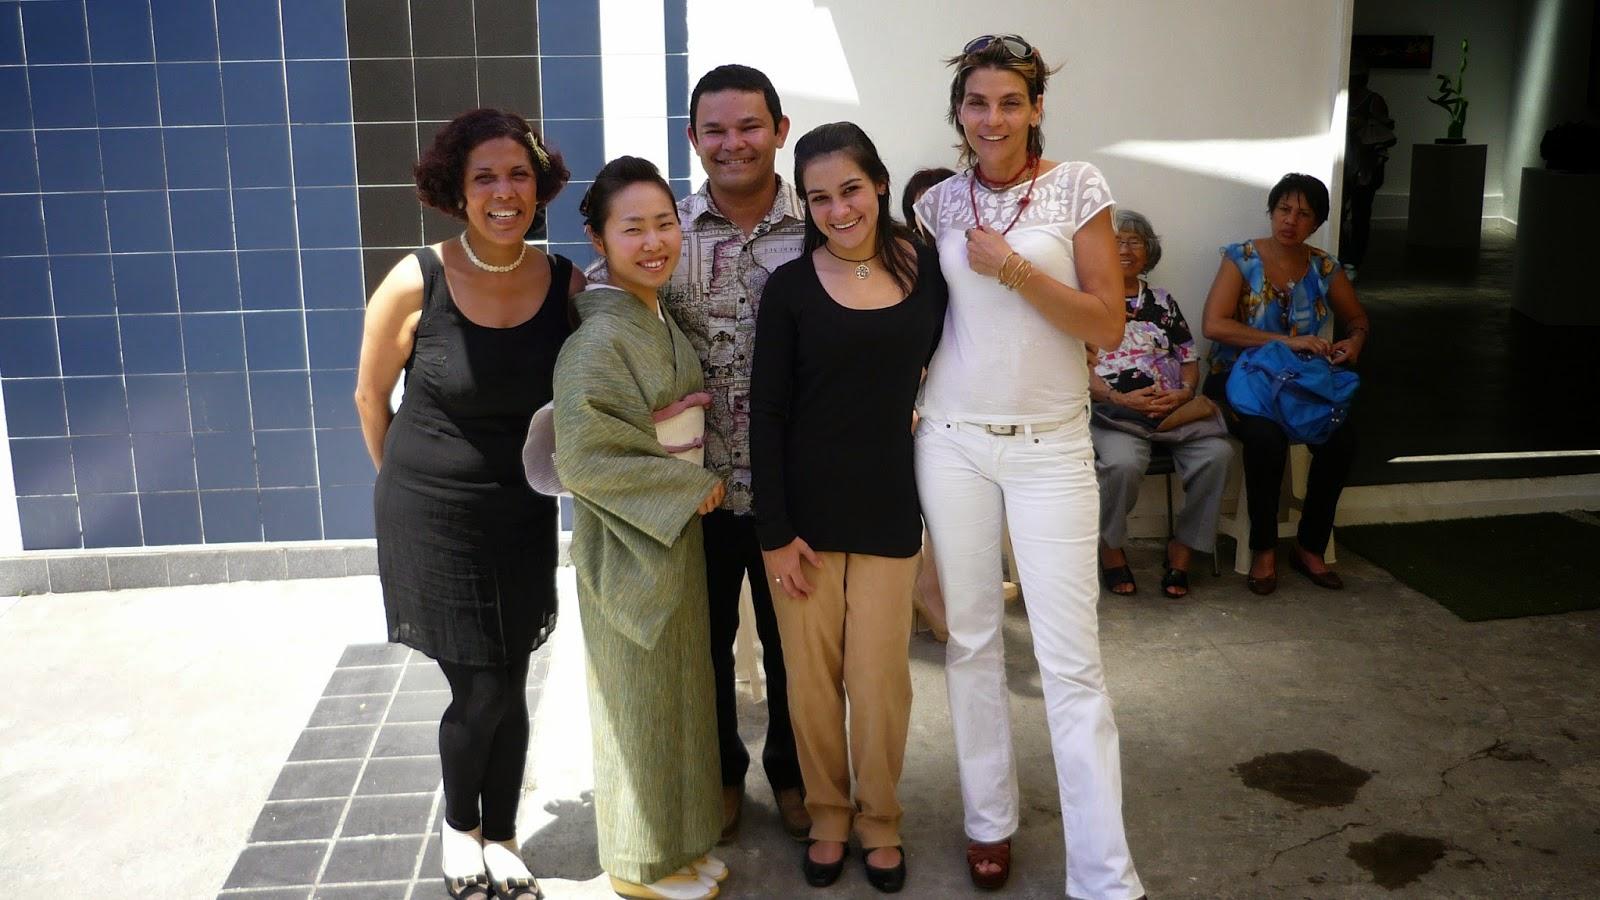 Gladys Calzadilla, Kyoto Kato, Israel Rojas Sánchez, Carola Erminy